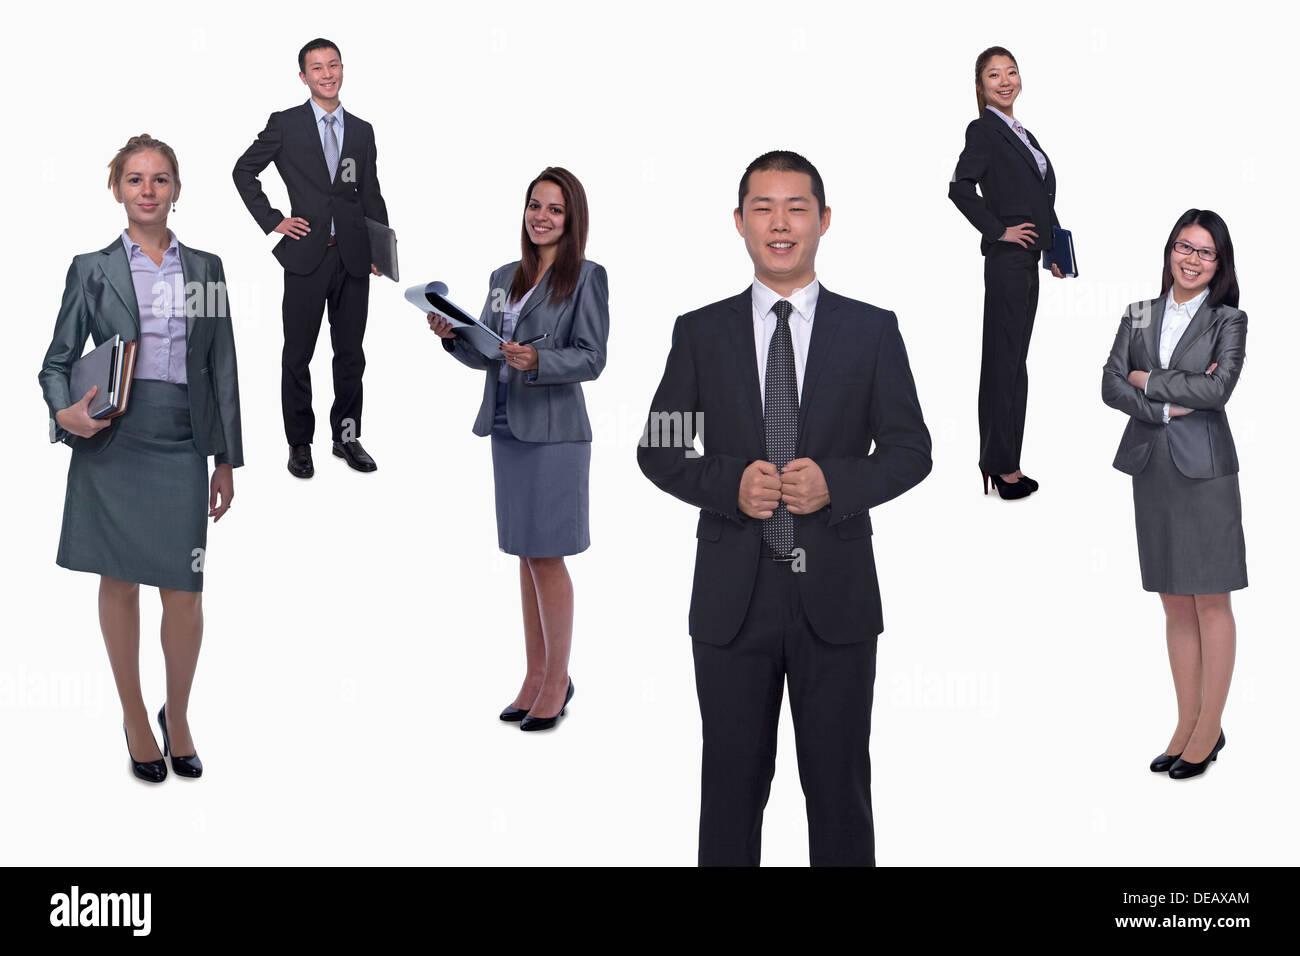 Medium group of smiling business people, portrait, full length, studio shot - Stock Image